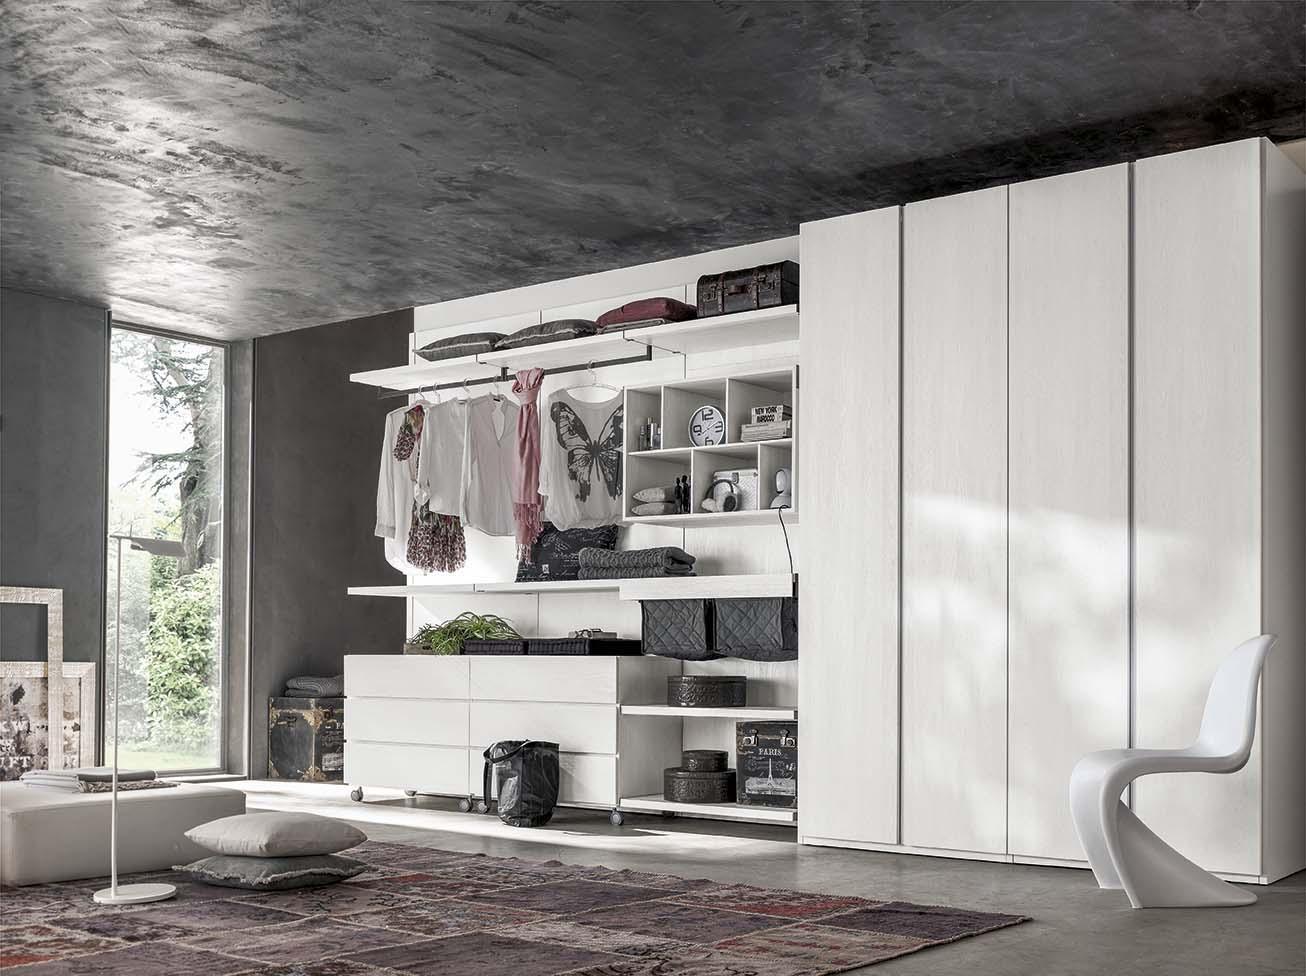 K obi camere da letto moderne mobili sparaco - Offerte camere da letto moderne ...